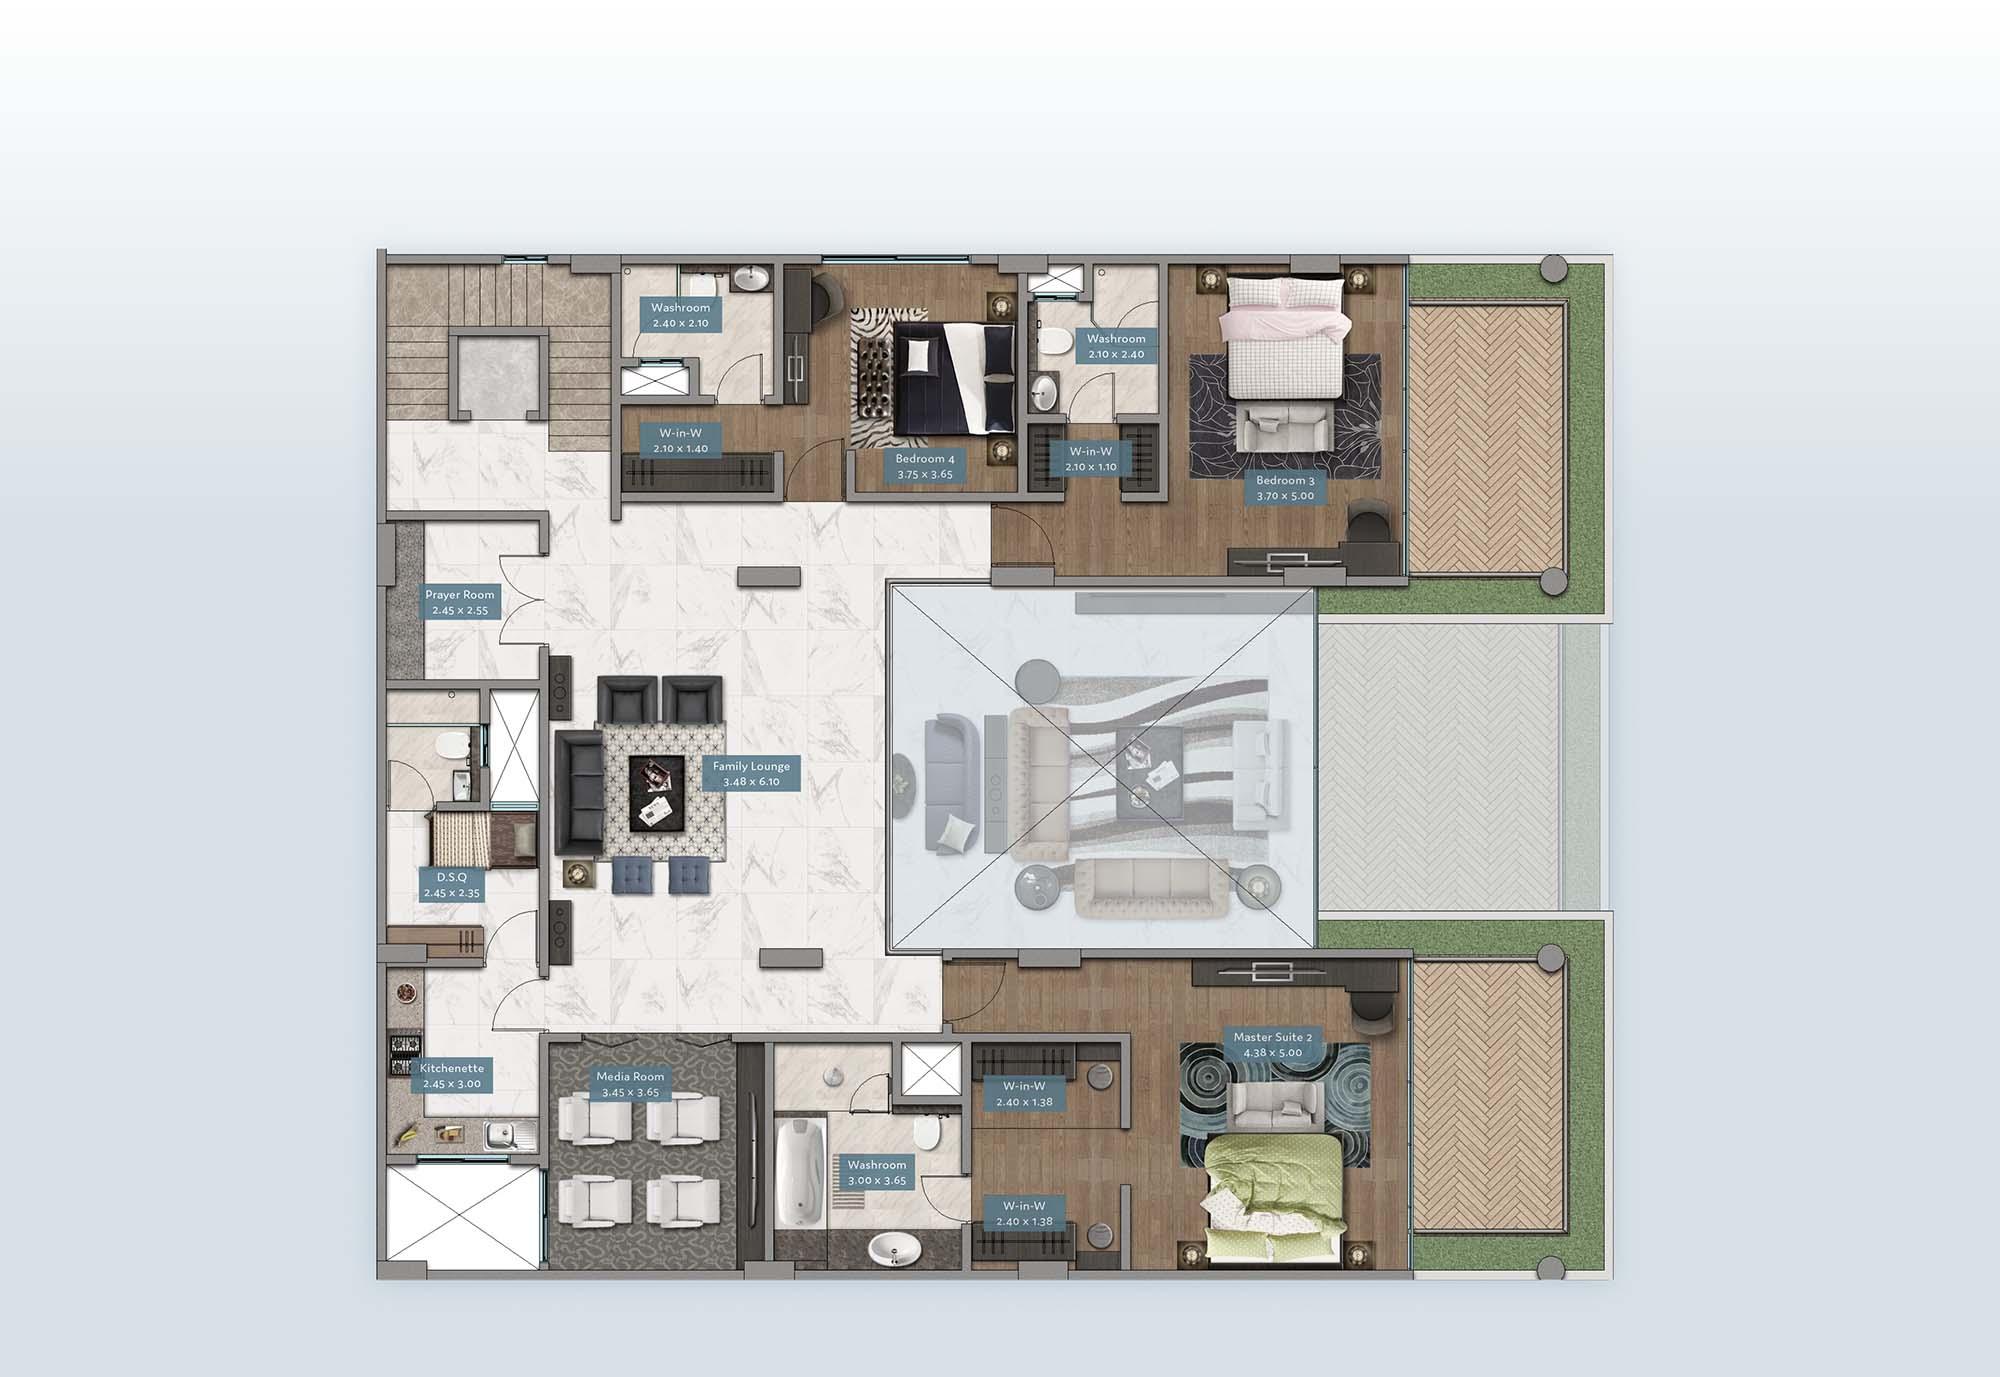 Kyuna View Penthouse | Floorplan | No. P2 & P5 - Level 2